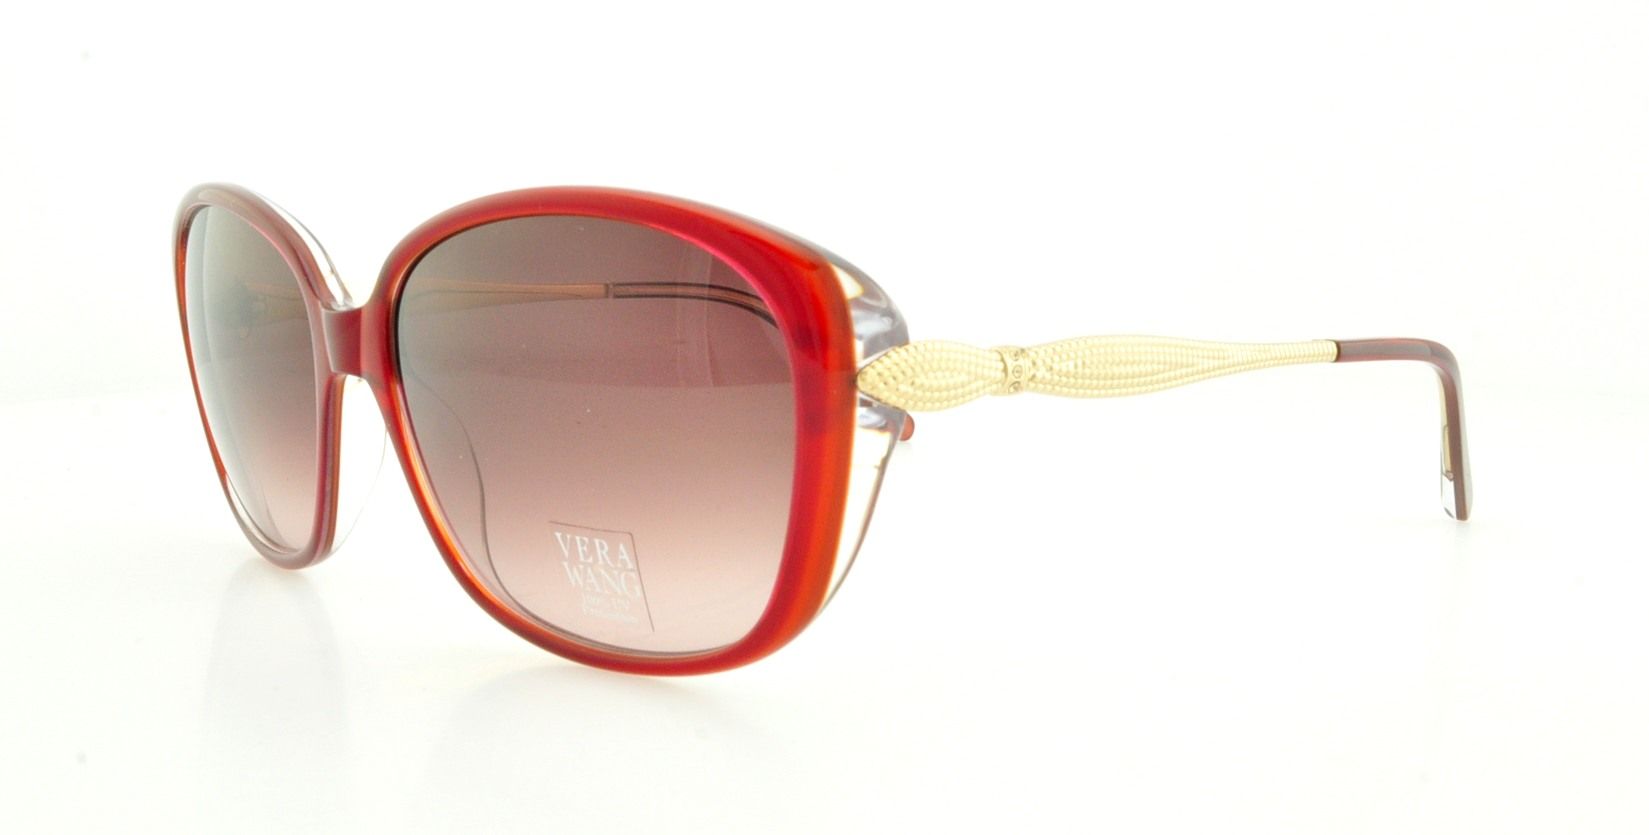 5c05f9950d VERA WANG Sunglasses LORNA Ruby 56MM 715317877947